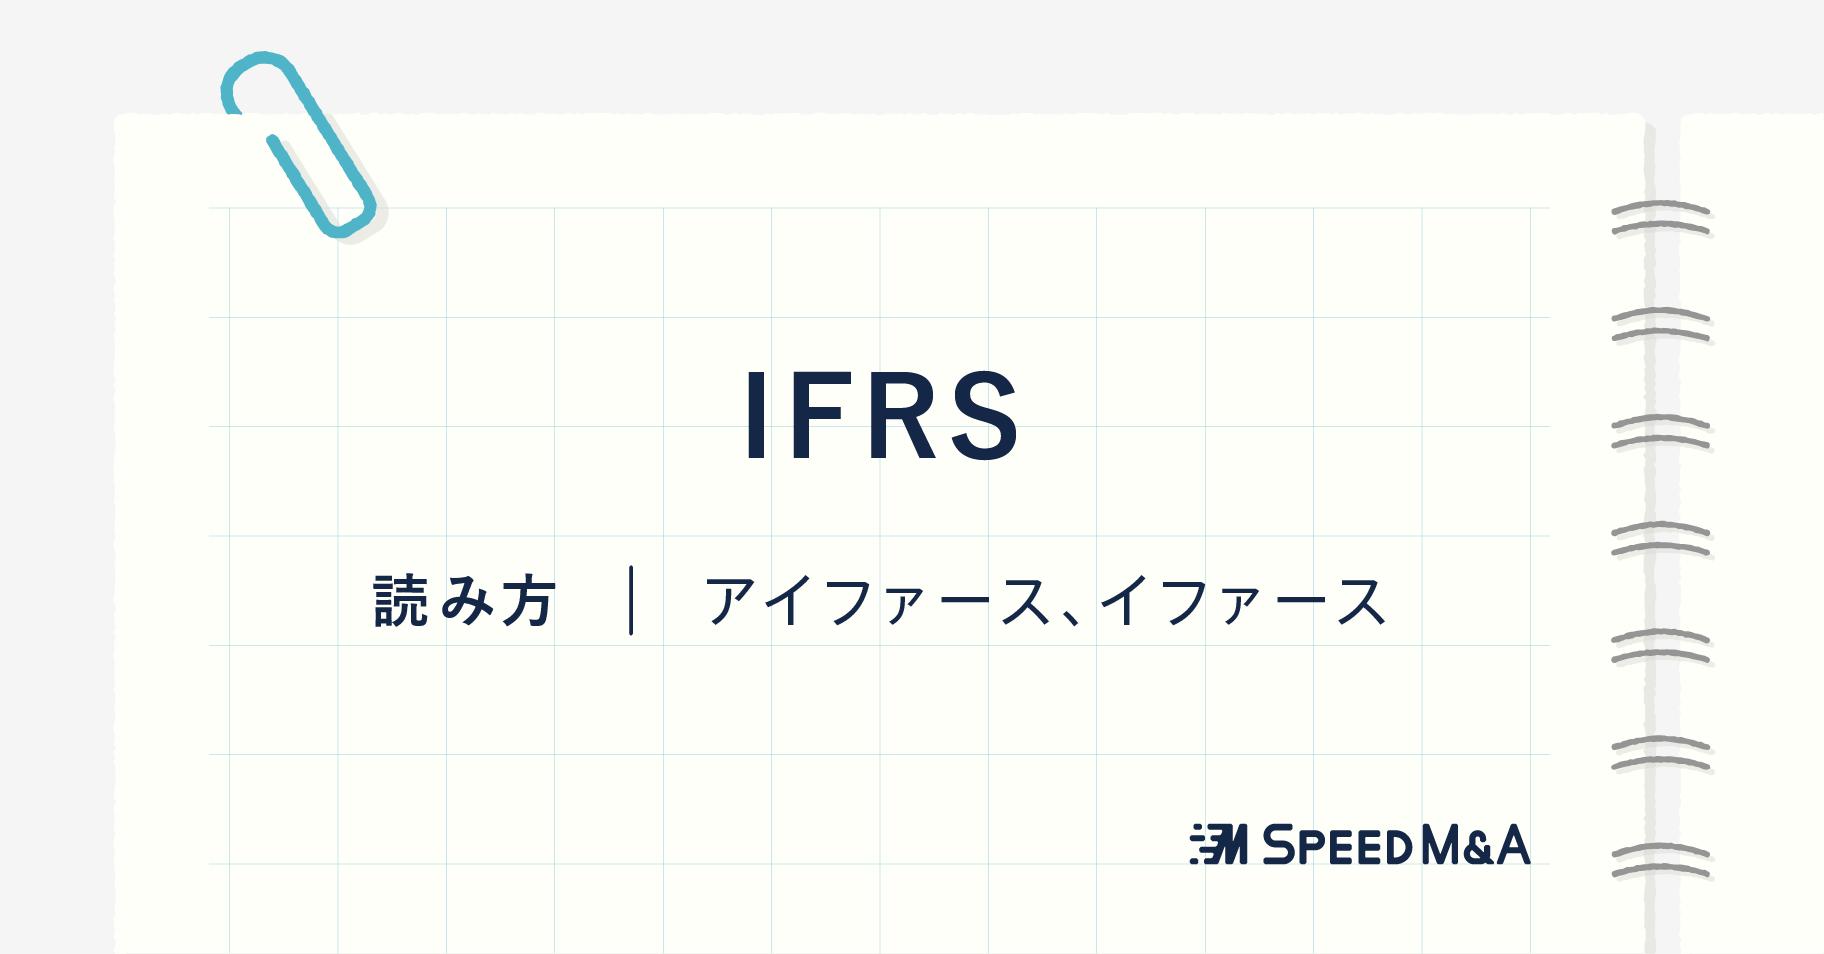 IFRSとは